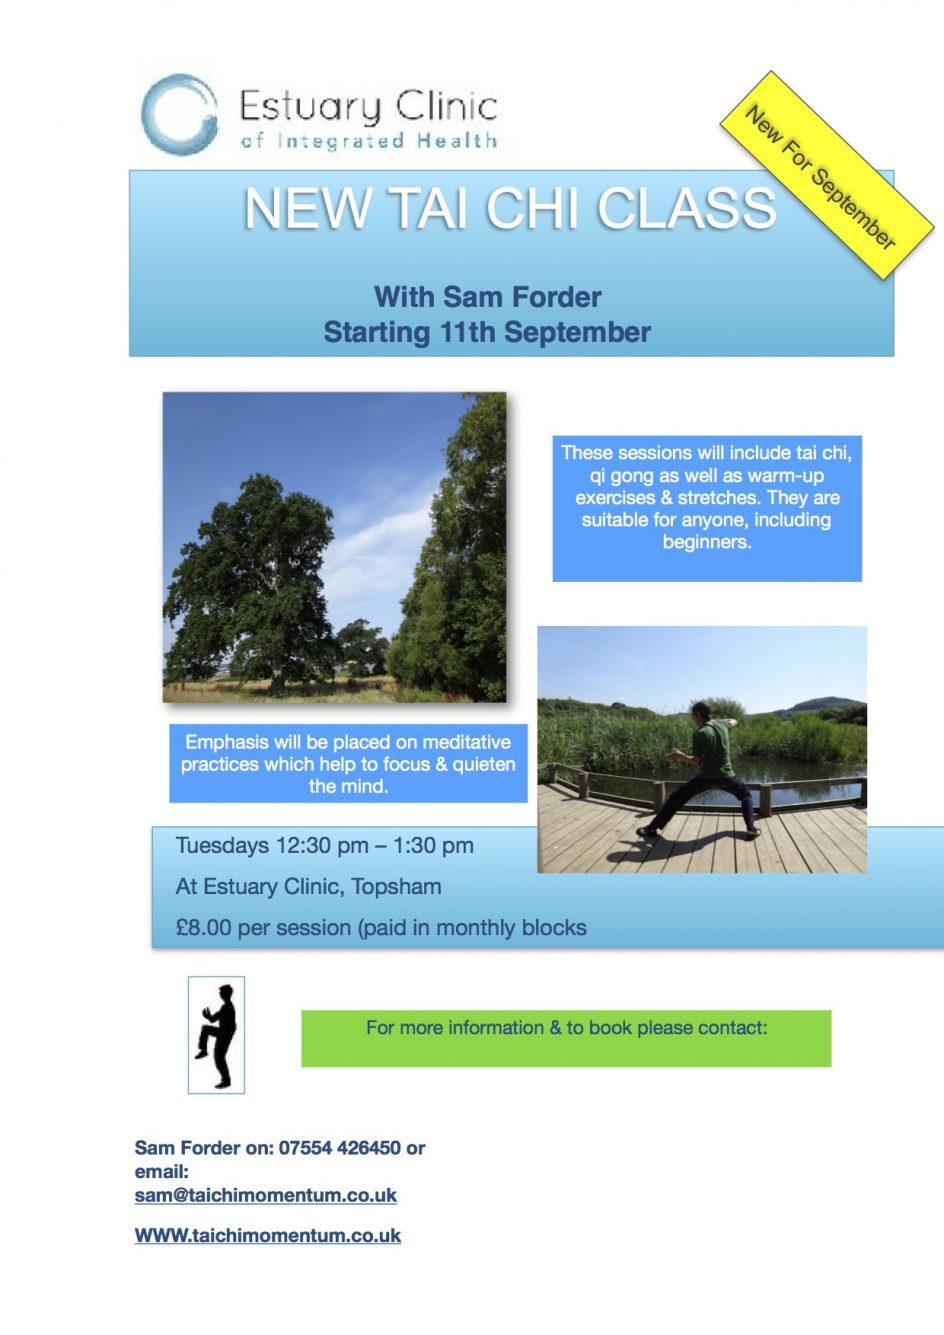 Tai chi class starting in September